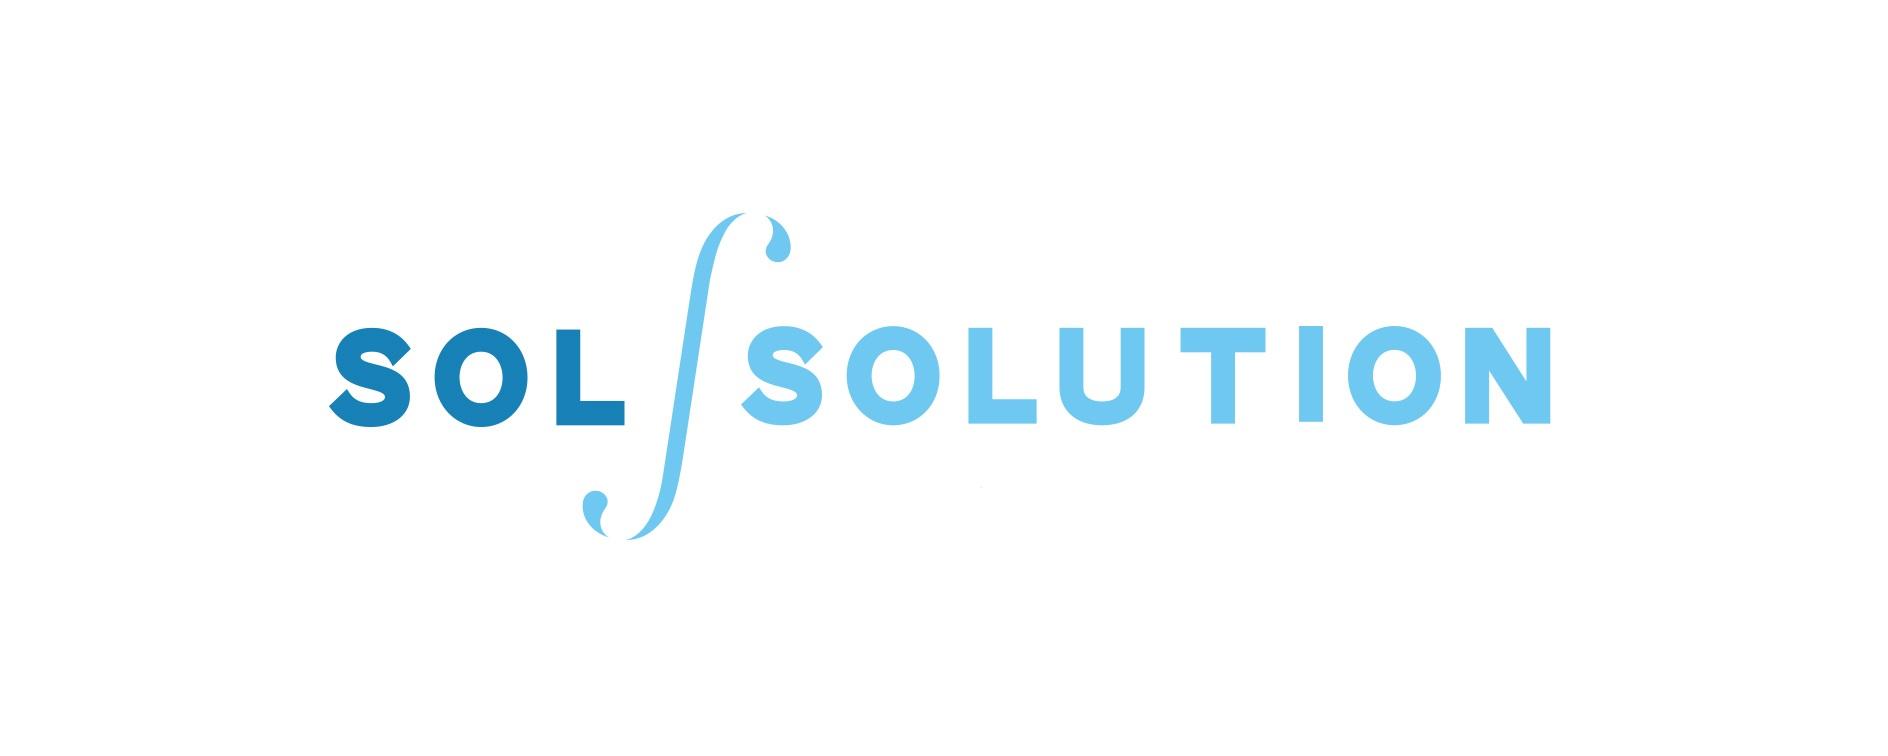 LOGO_SOL_SOLUTION_RVB - Espagnol